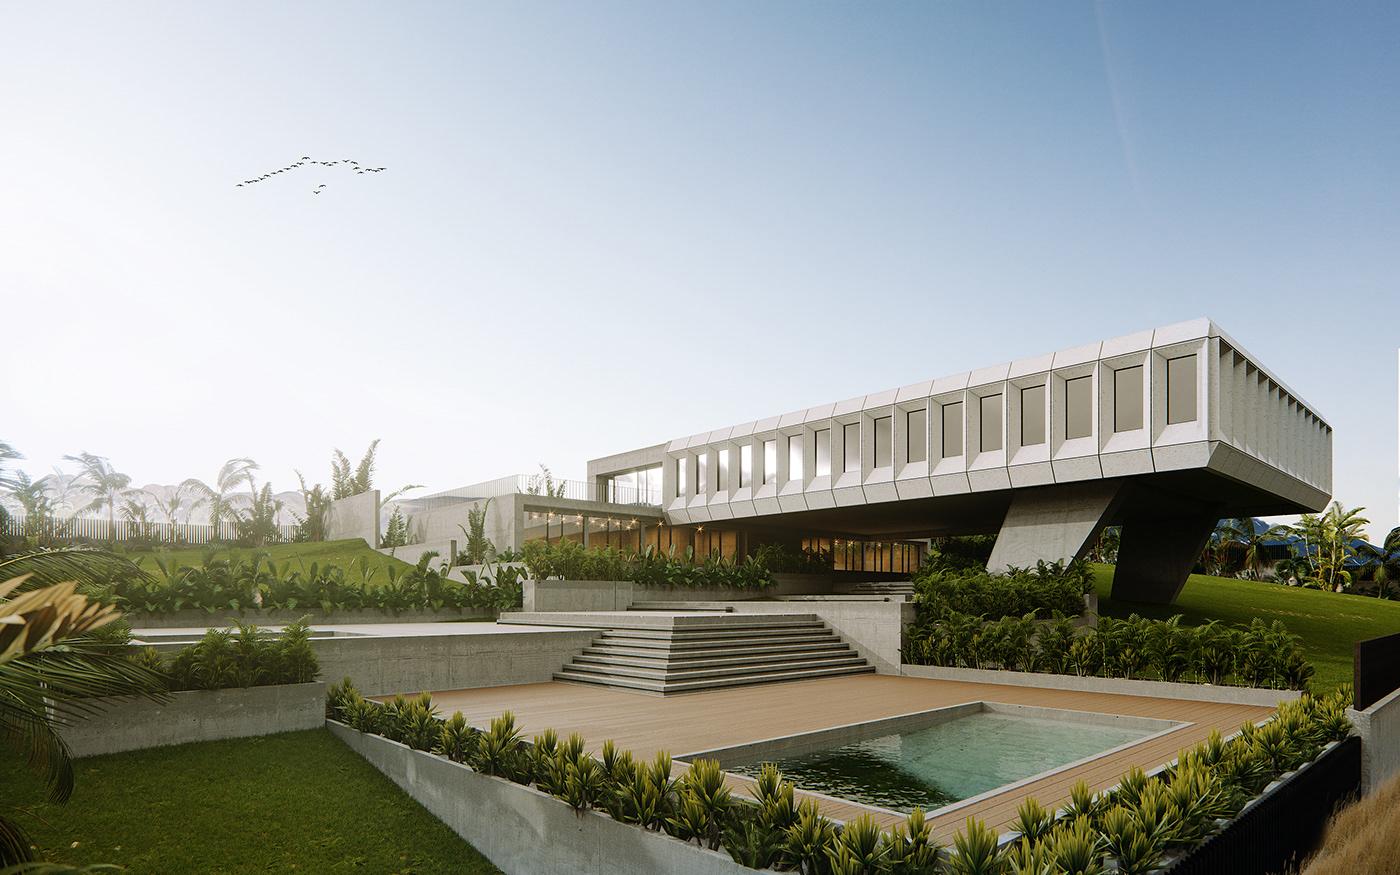 arhitecture design Soviet Georgia Tropical modern Villa